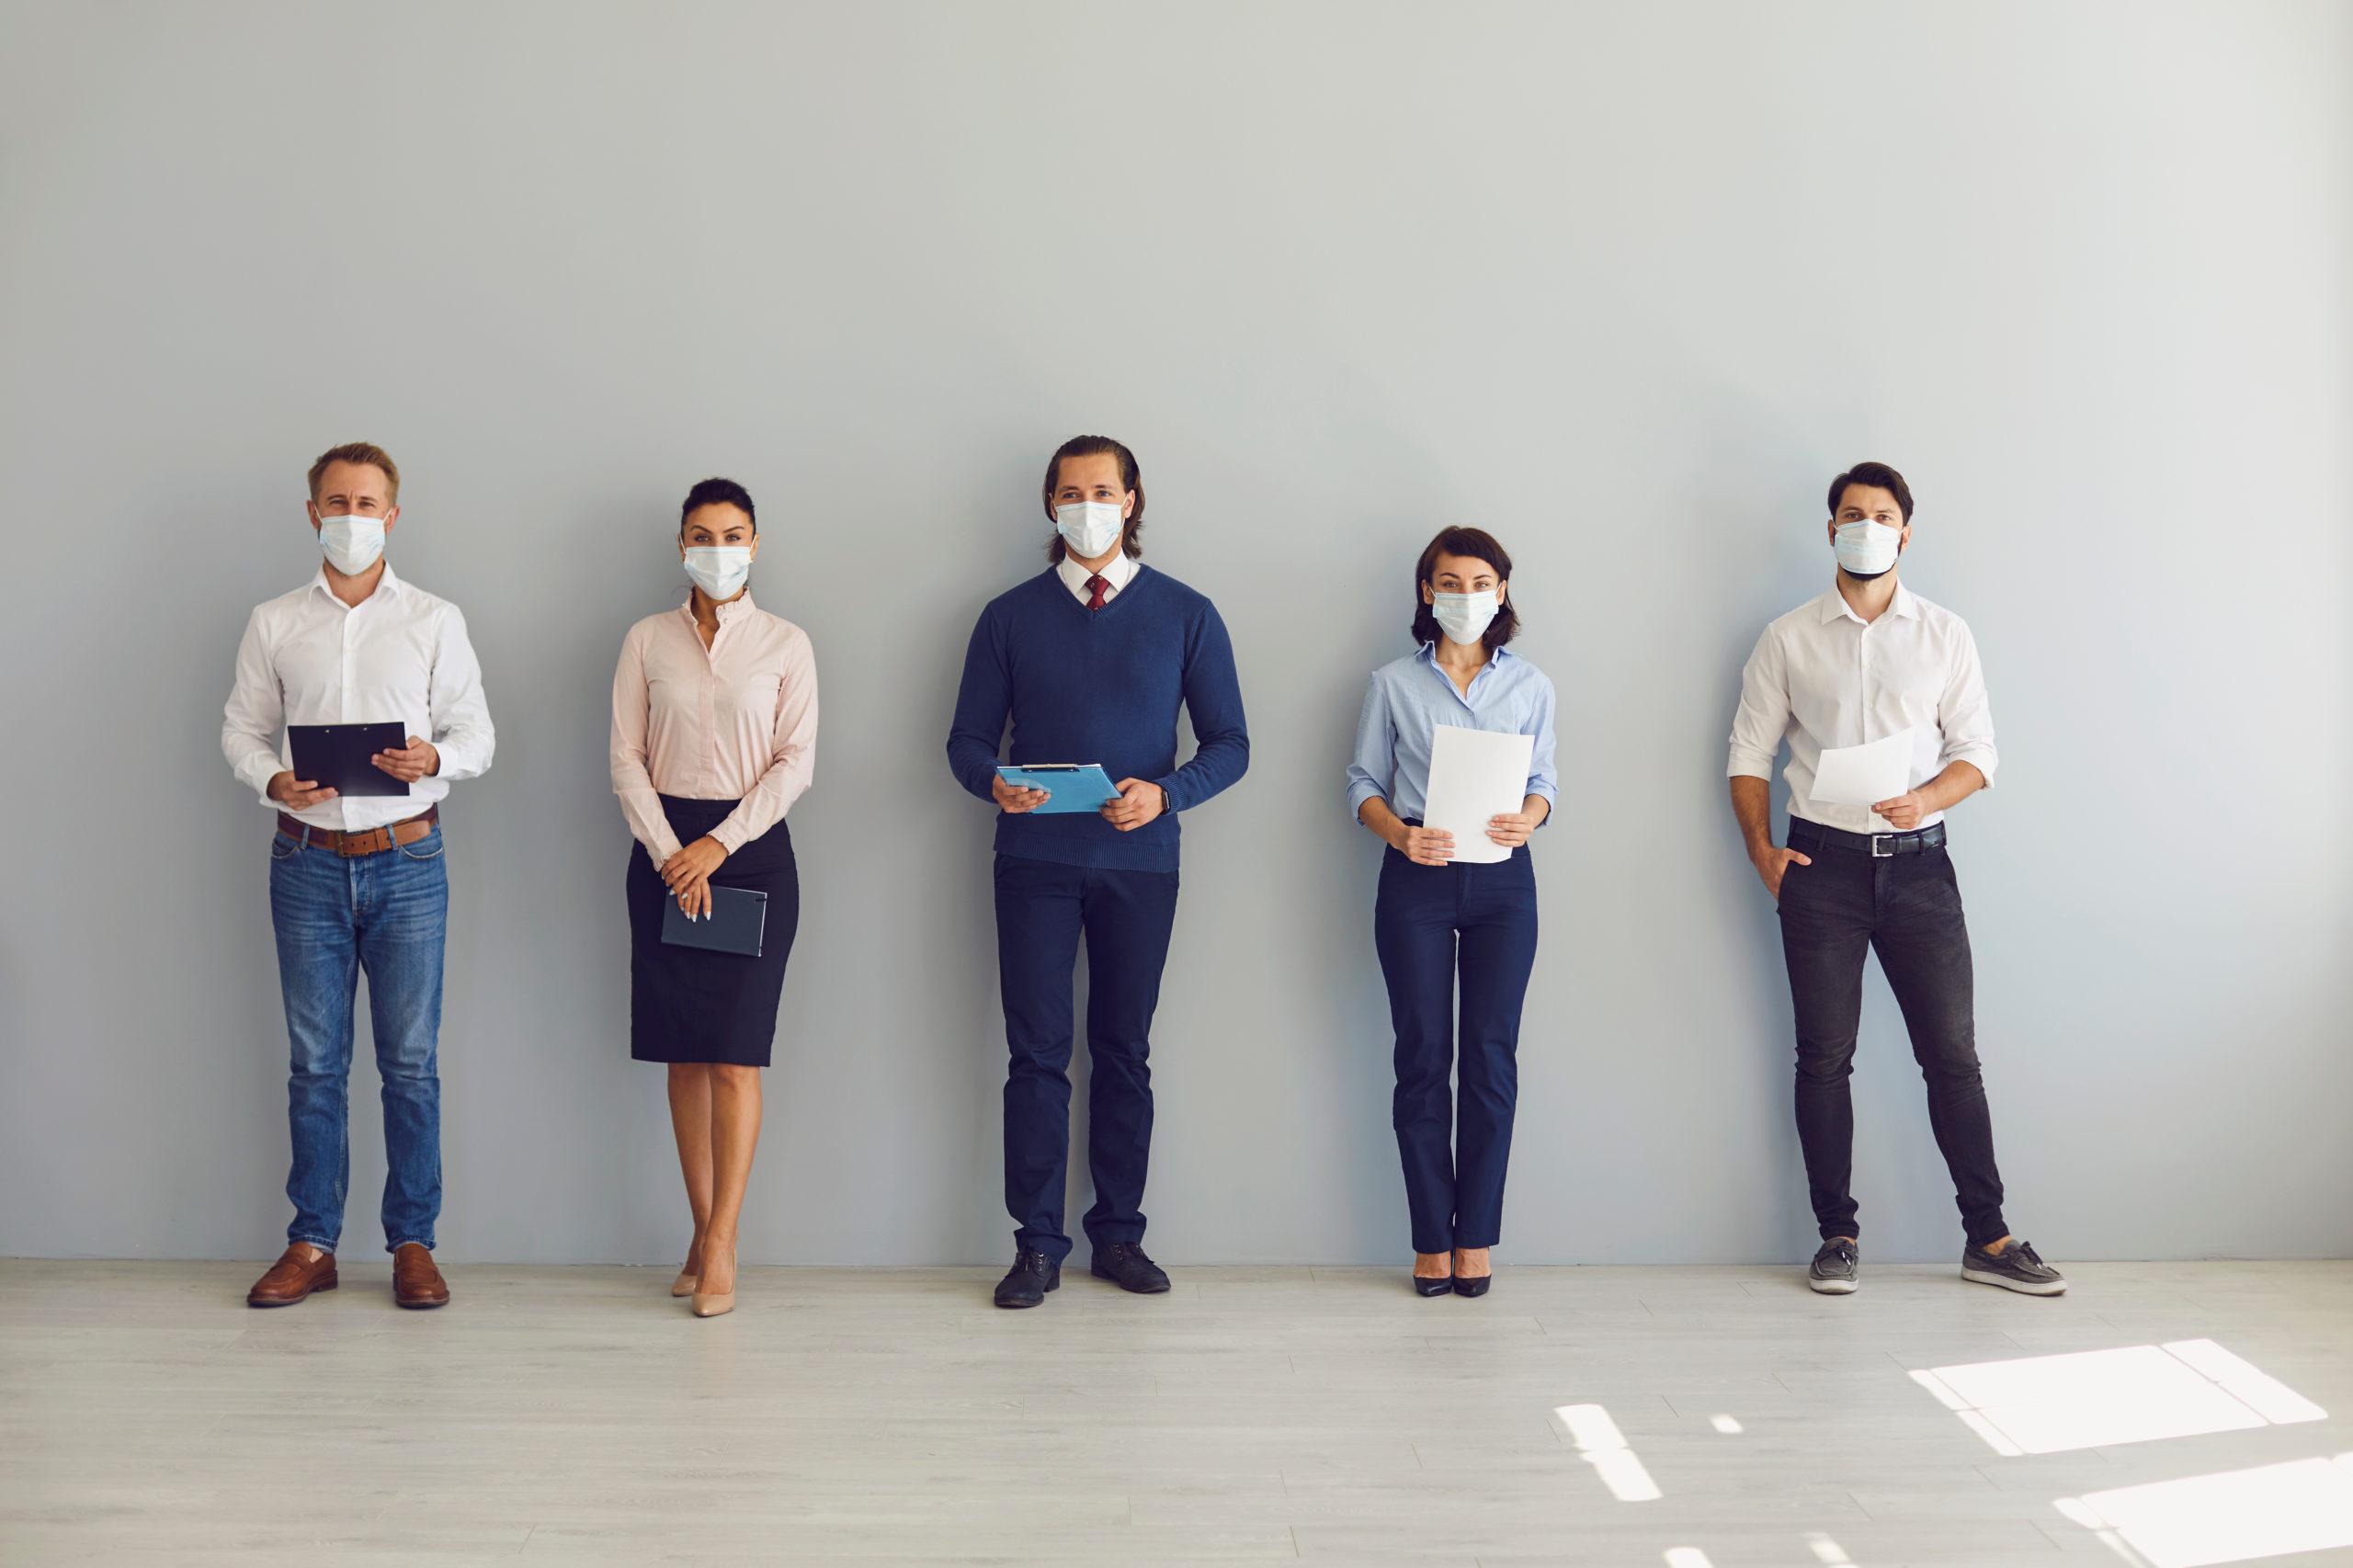 COVID-19: Pandemic Job-hunting